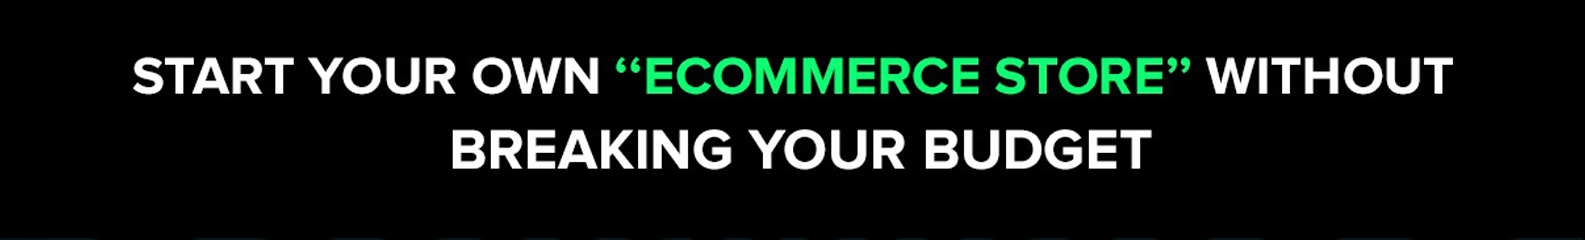 Shopify Killer - A Complete e-Commerce Solution - DealMirror